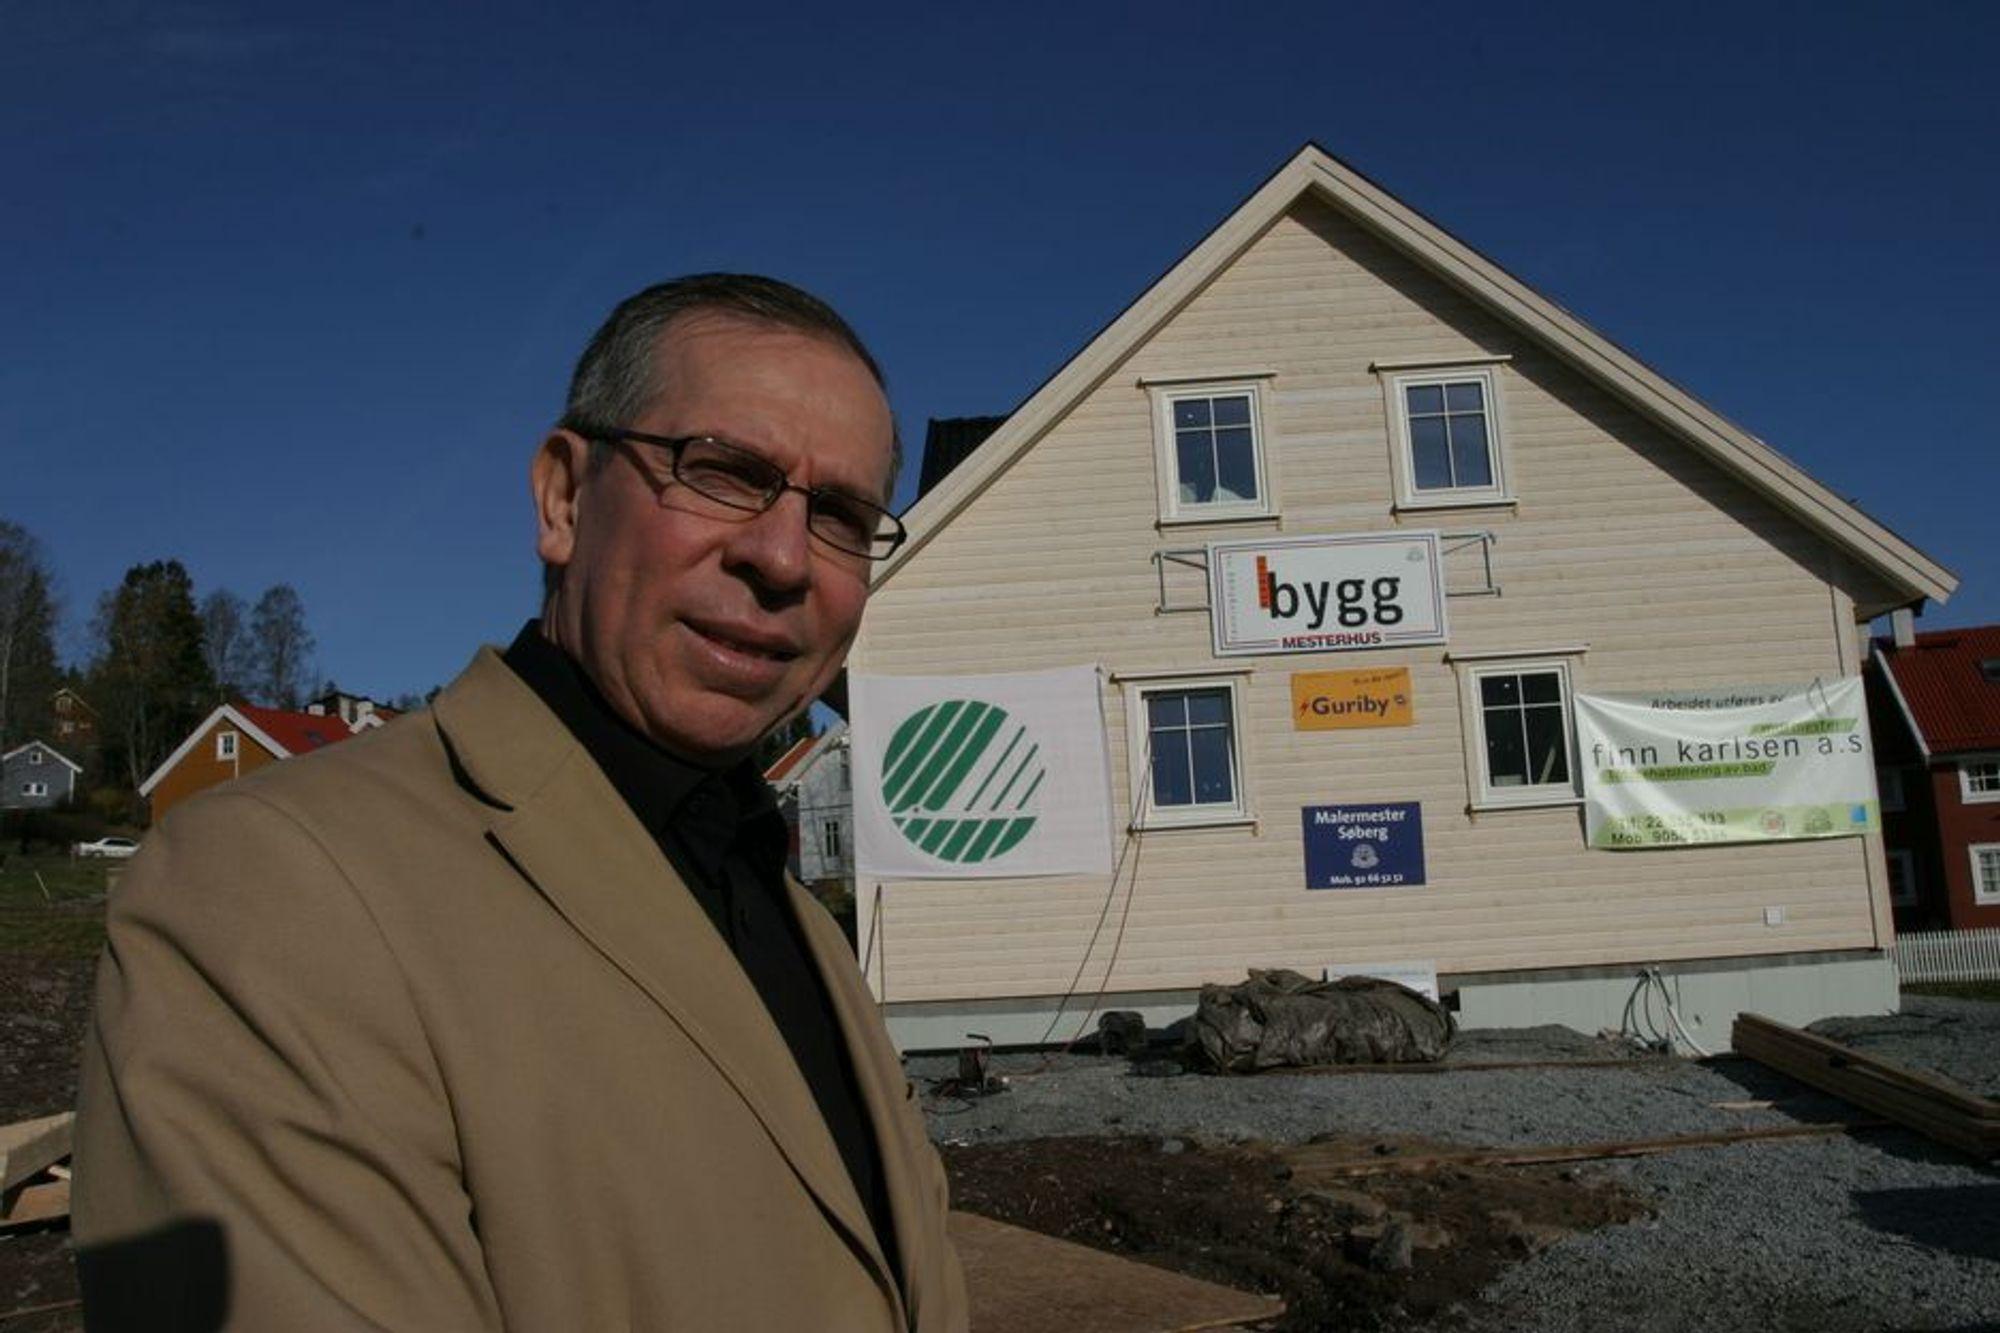 HUS FOR FREMTIDEN: - Dette huset har ekstremt isolerende materialer og et selvregulerende klimasystem, sier rådgiver for byplanlegging i Bærum kommune, Pedro Ardila.